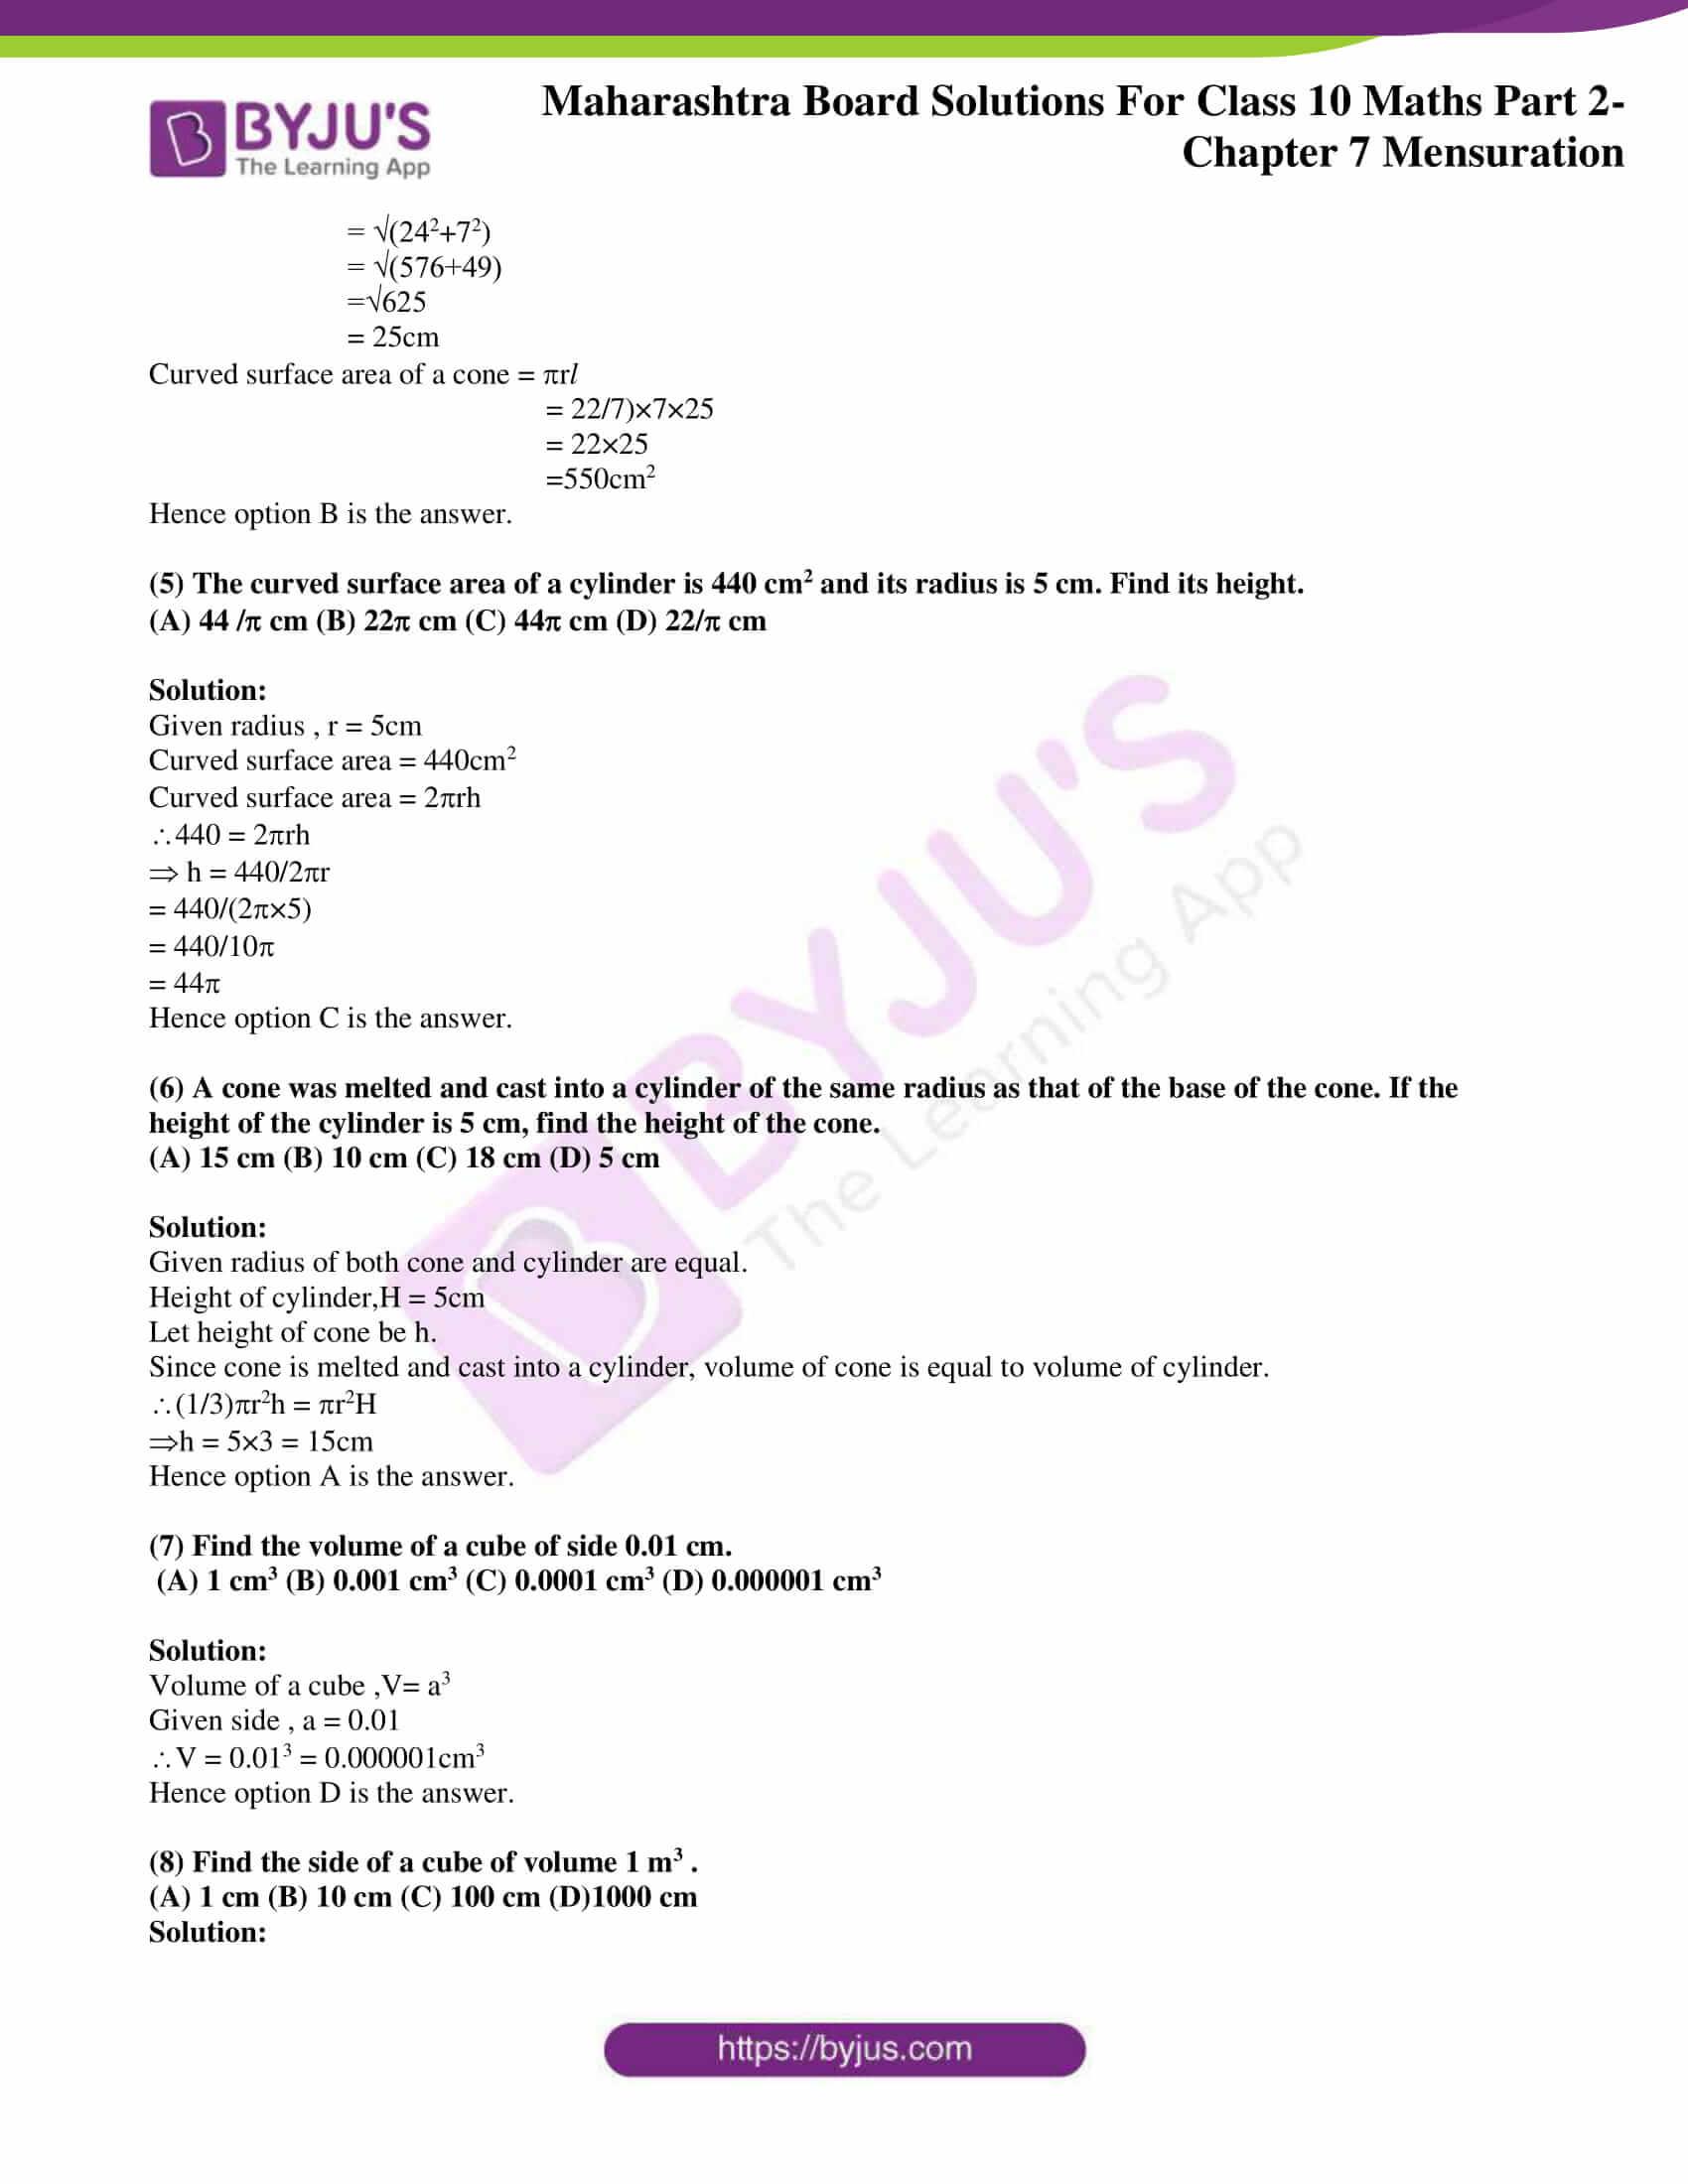 msbshse sol class 10 maths part 2 chapter 7 23